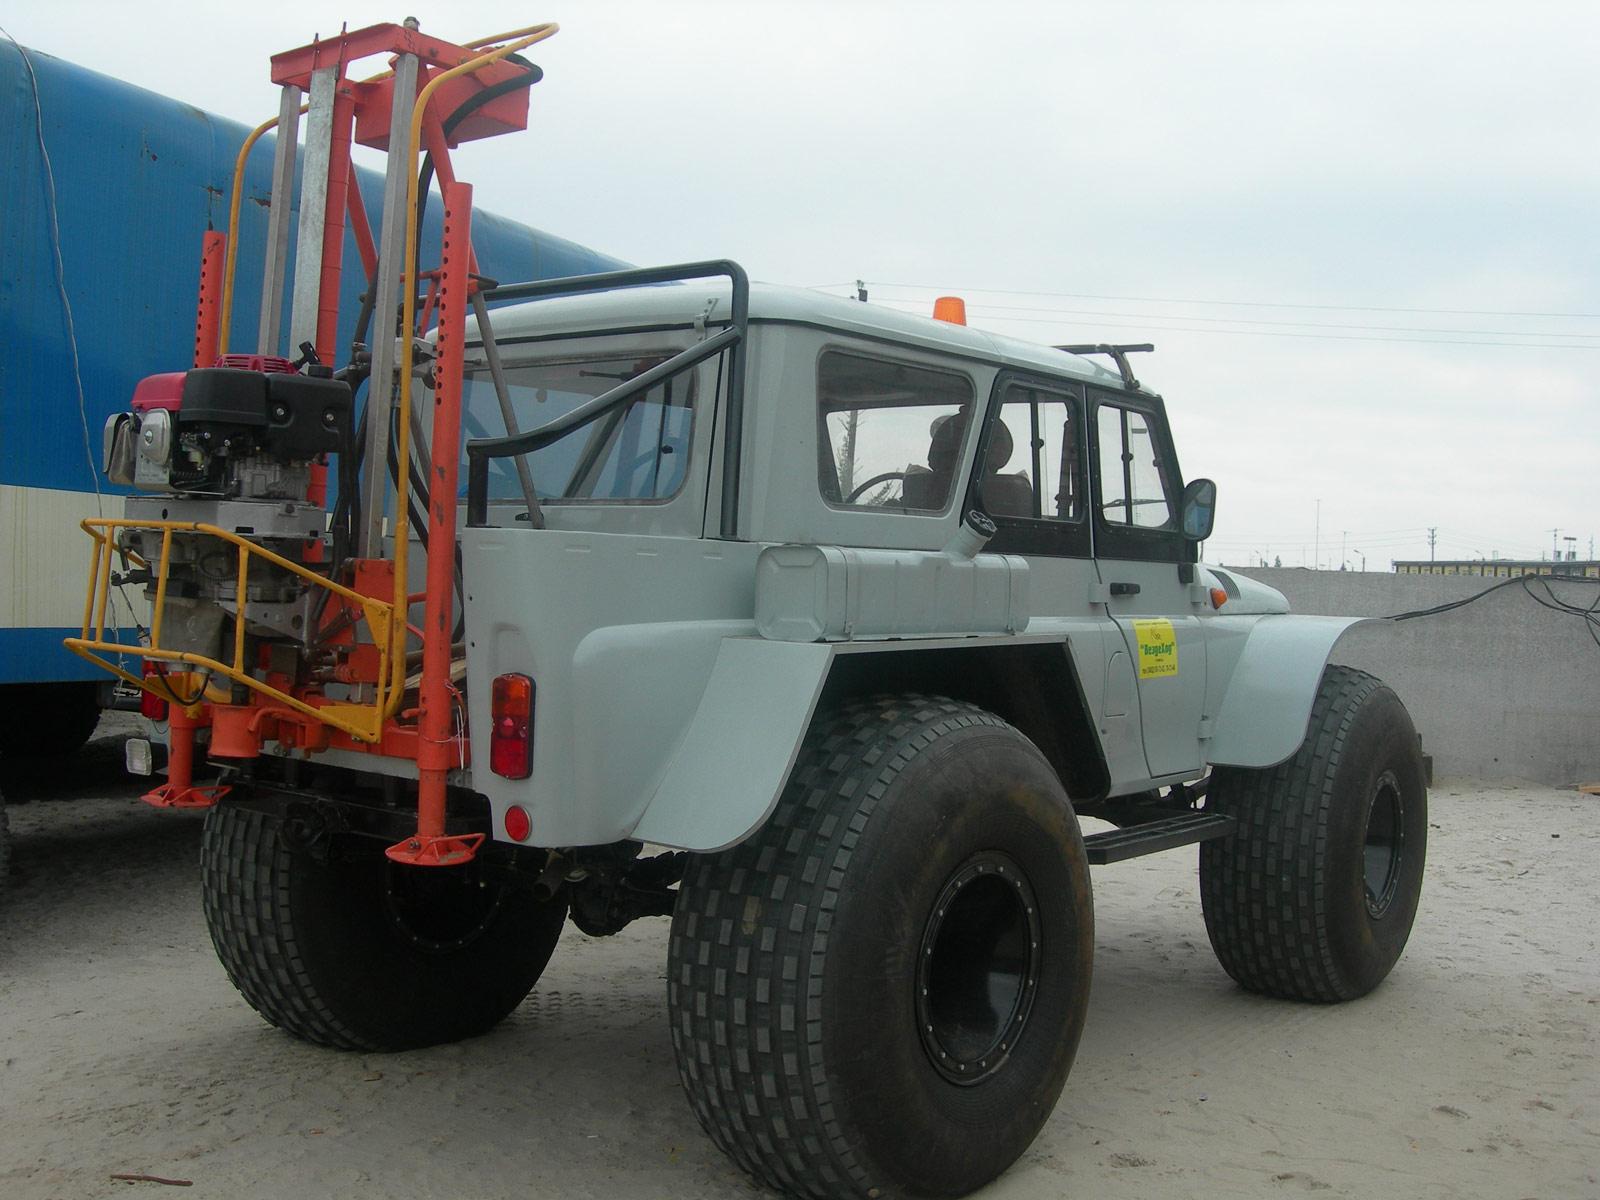 Установка буровая шнековая малогабаритная УБШМ-1-13 на базе СБ-81